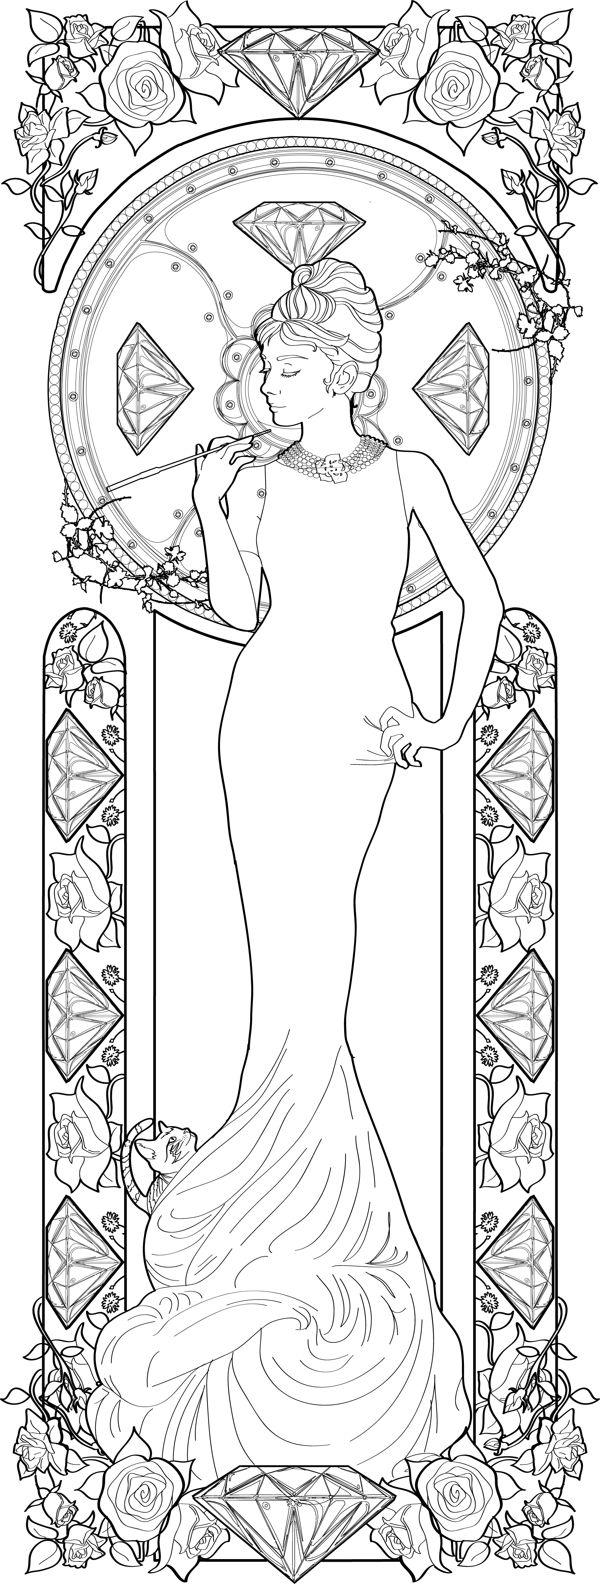 Audrey Hepburn by Azael Olmos, via Behance